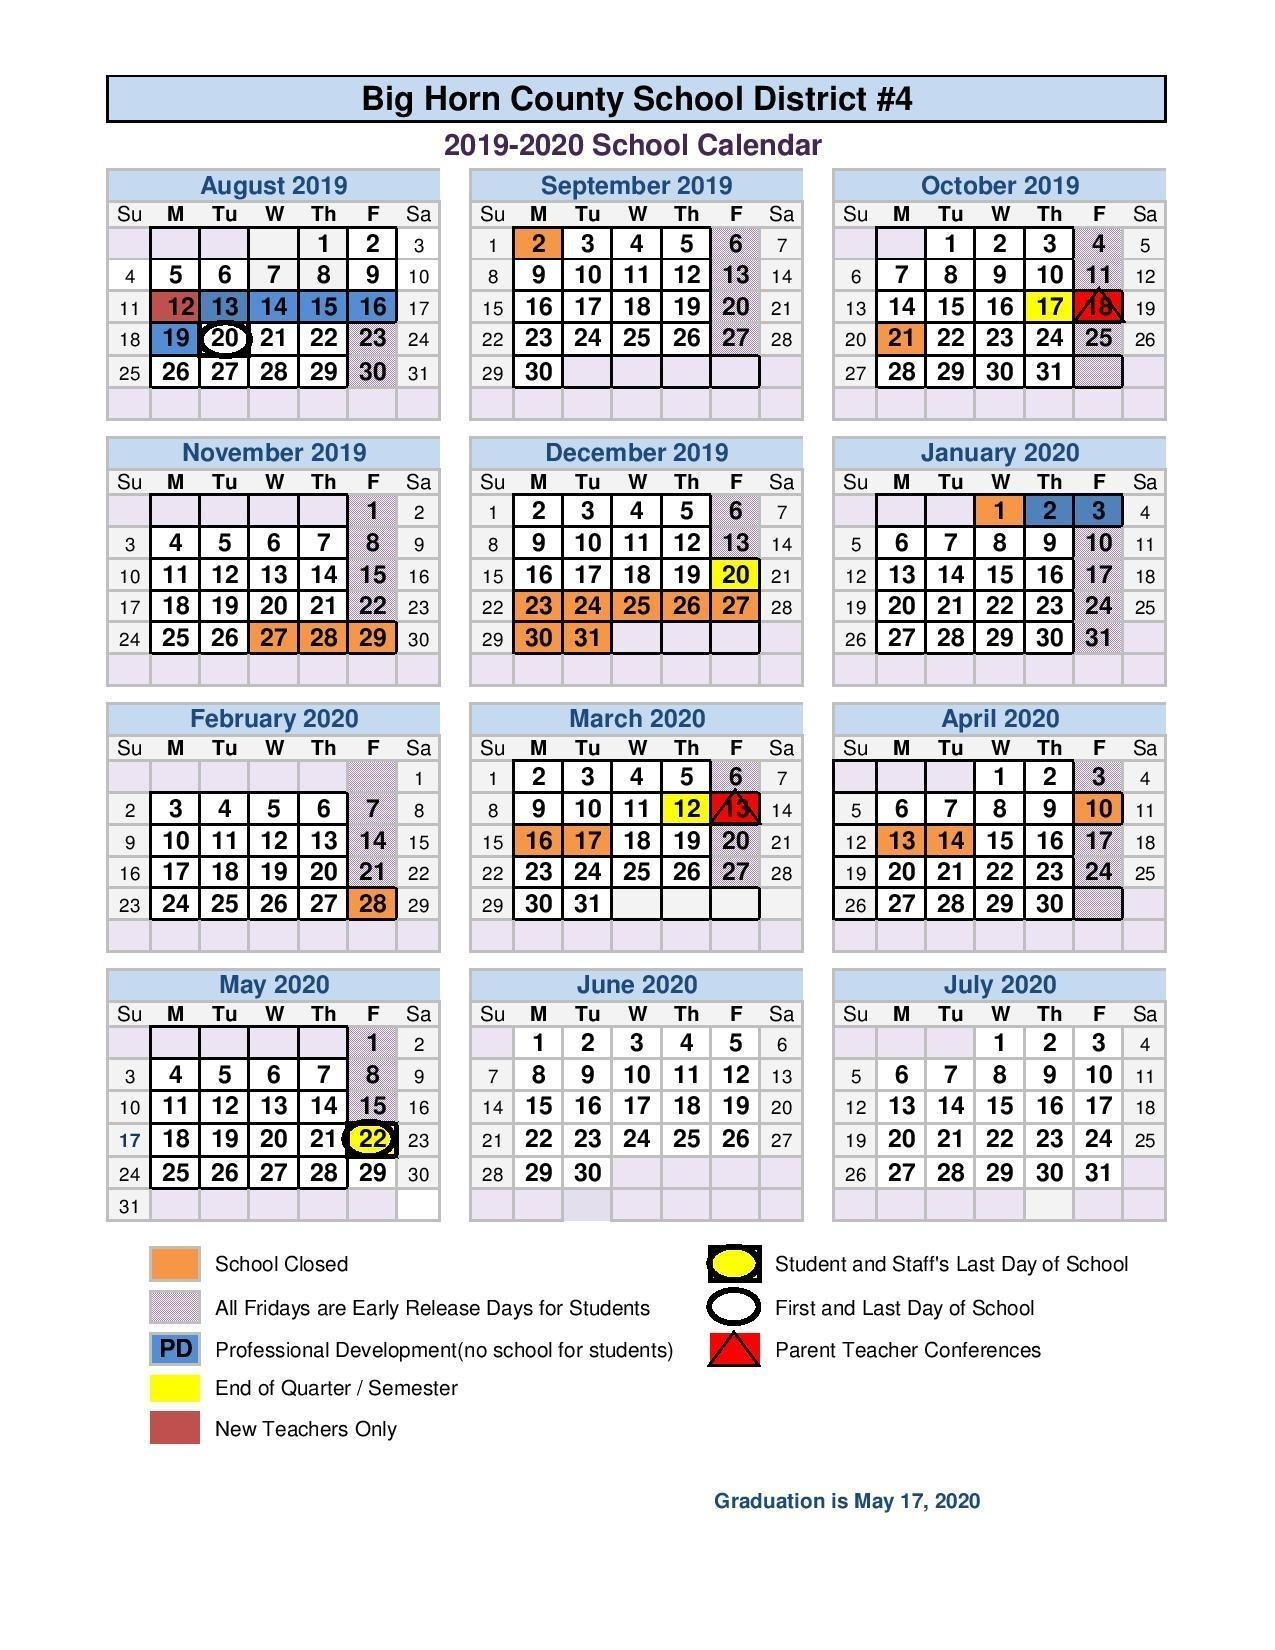 School Calendar_Calendar Riverside School Board